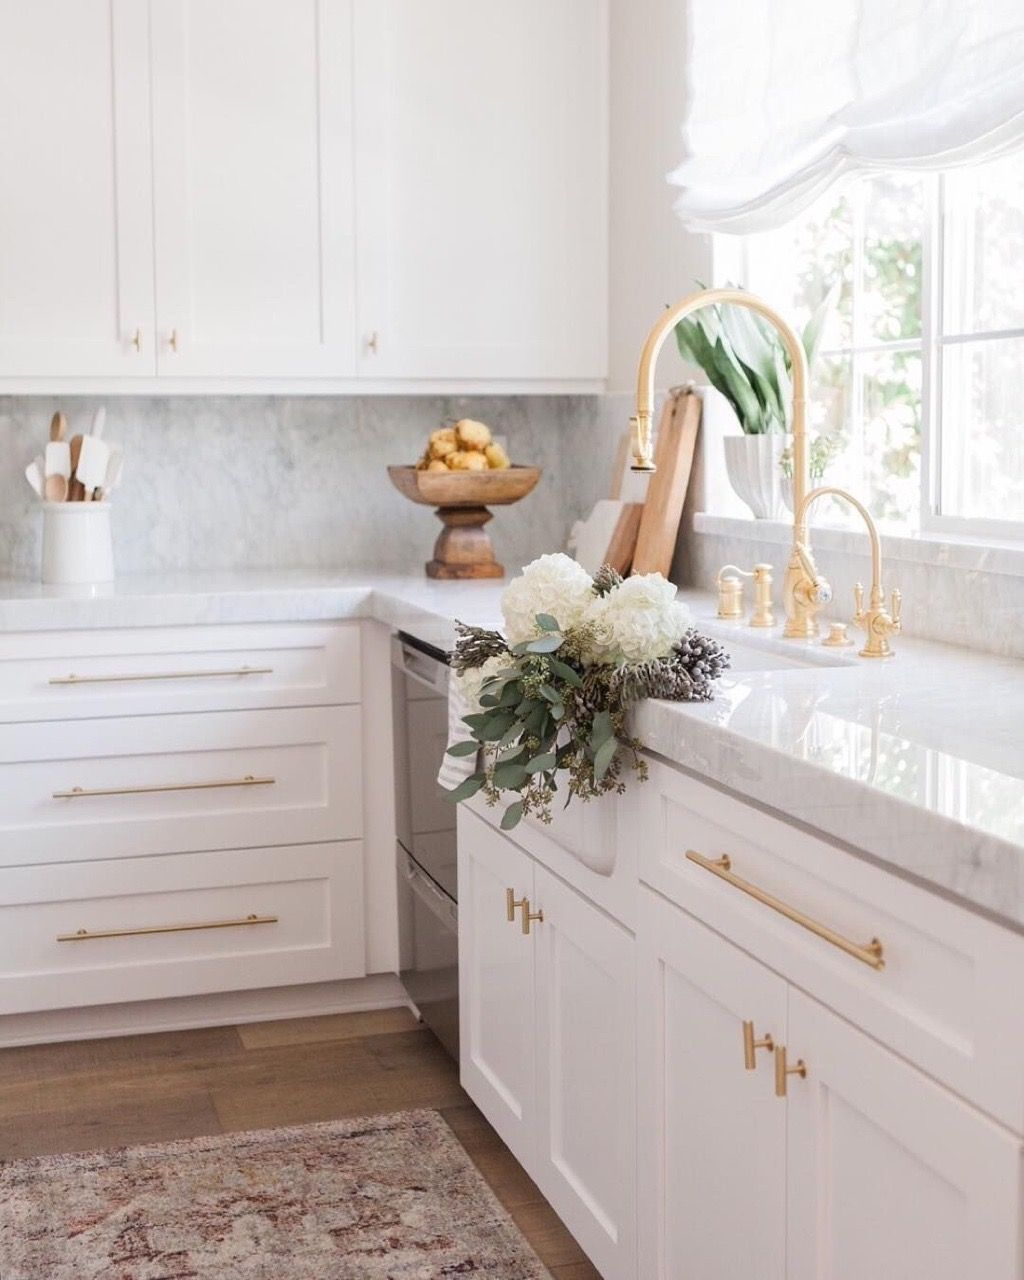 do we like the gold hardware kitchen inspirations kitchen design kitchen renovation on kitchen remodel gold hardware id=82148